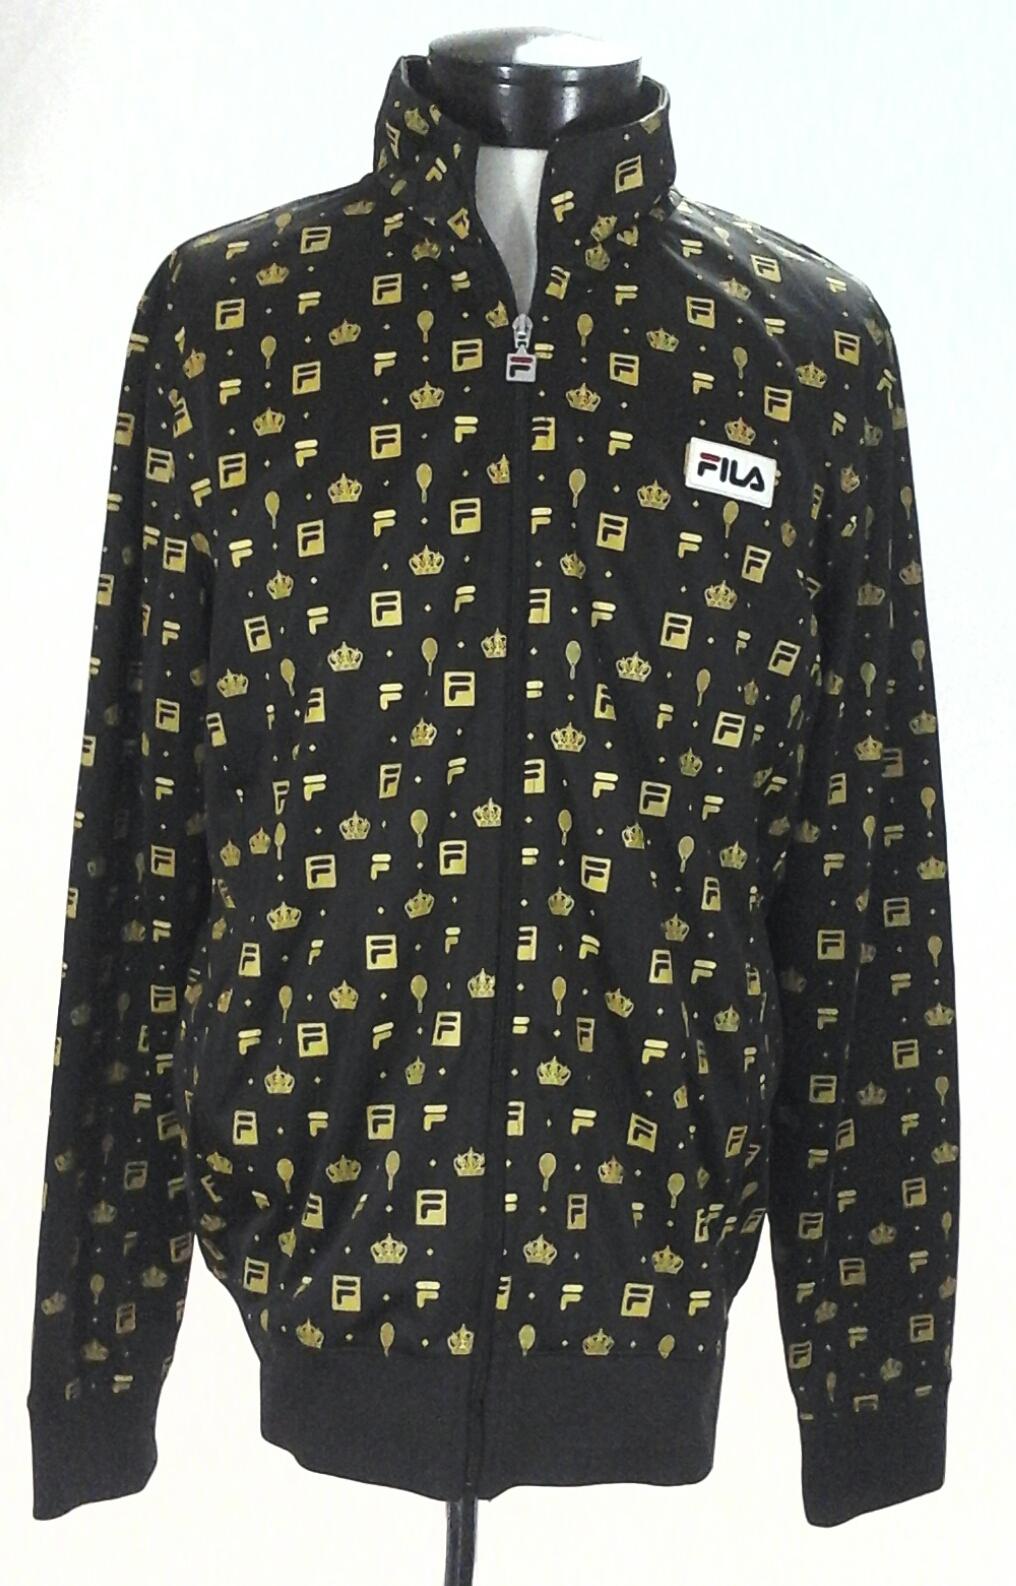 6ee4eb000af FILA Track Jacket for UO Brown/Gold Tennis Racket/Crown Print Zip Up Mens L  RARE